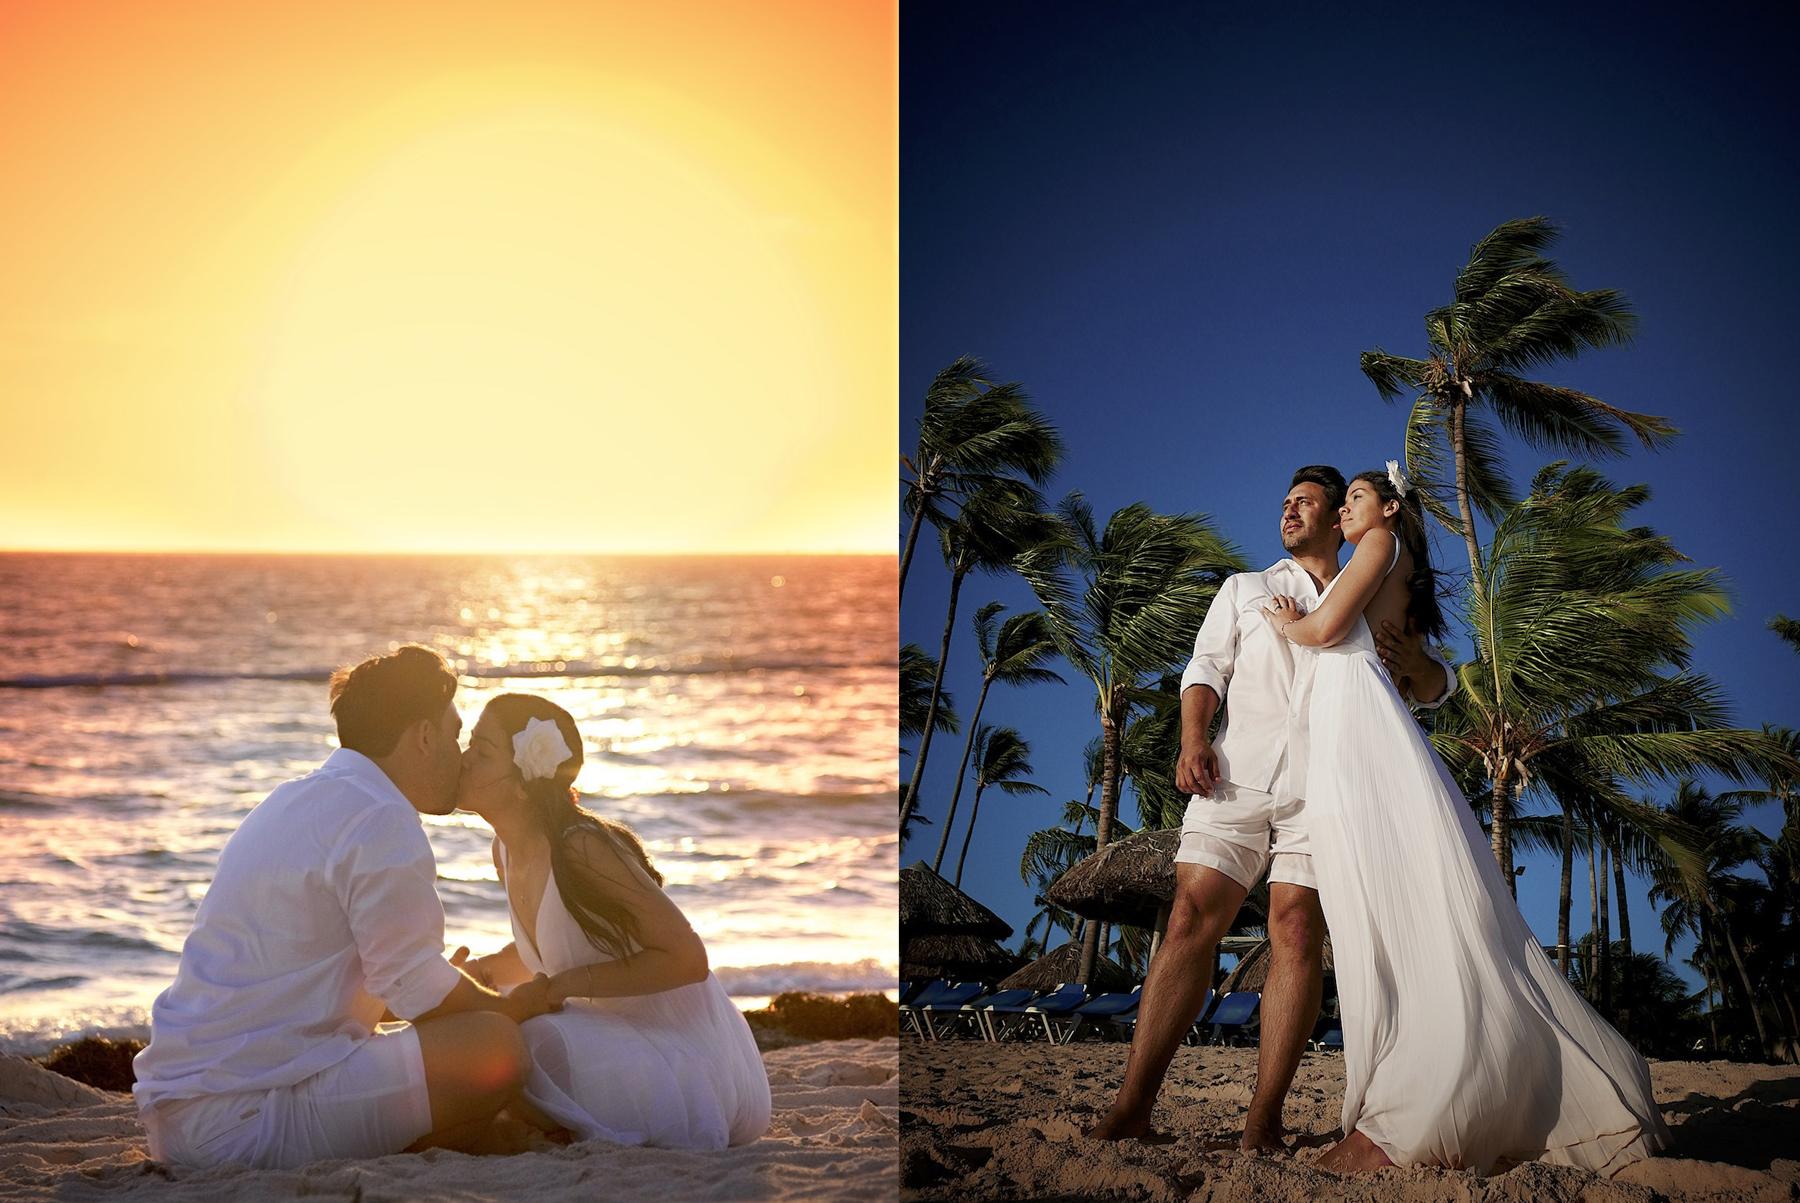 19f18ad5b9 Best destination wedding photographers in New York